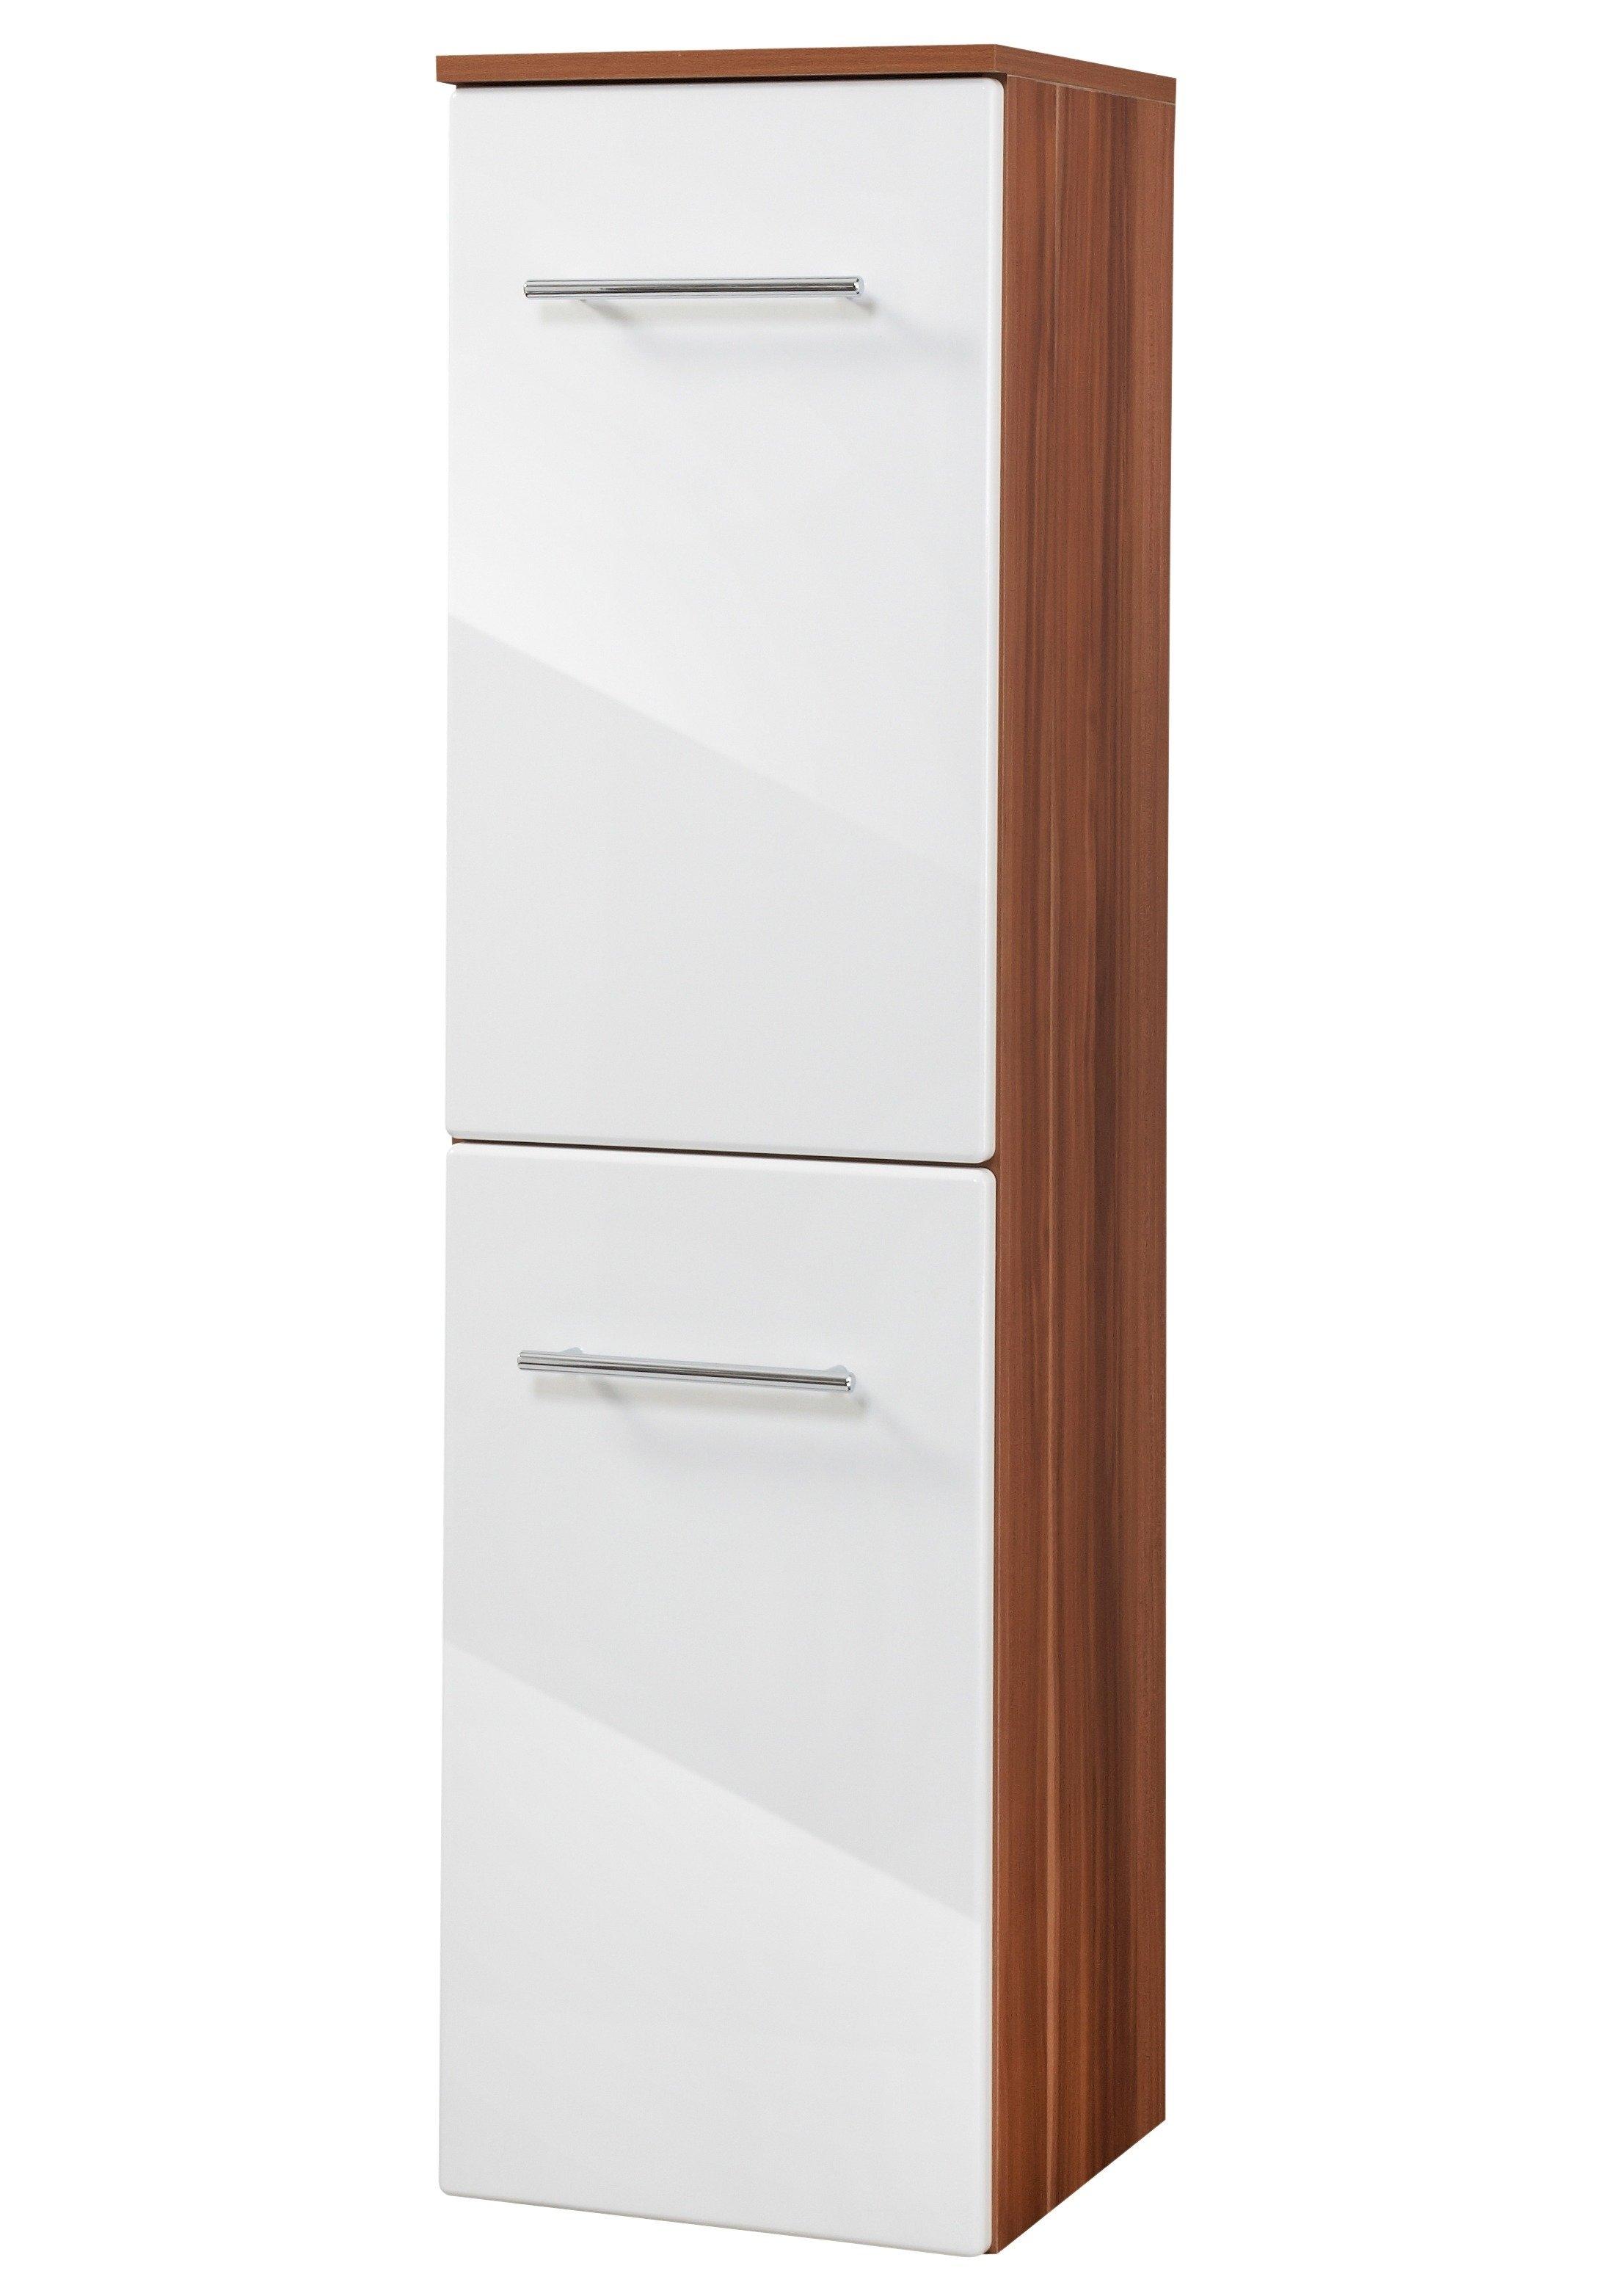 Kesper Midi kabinet »Monza«, Breedte 33,5 cm online kopen op otto.nl